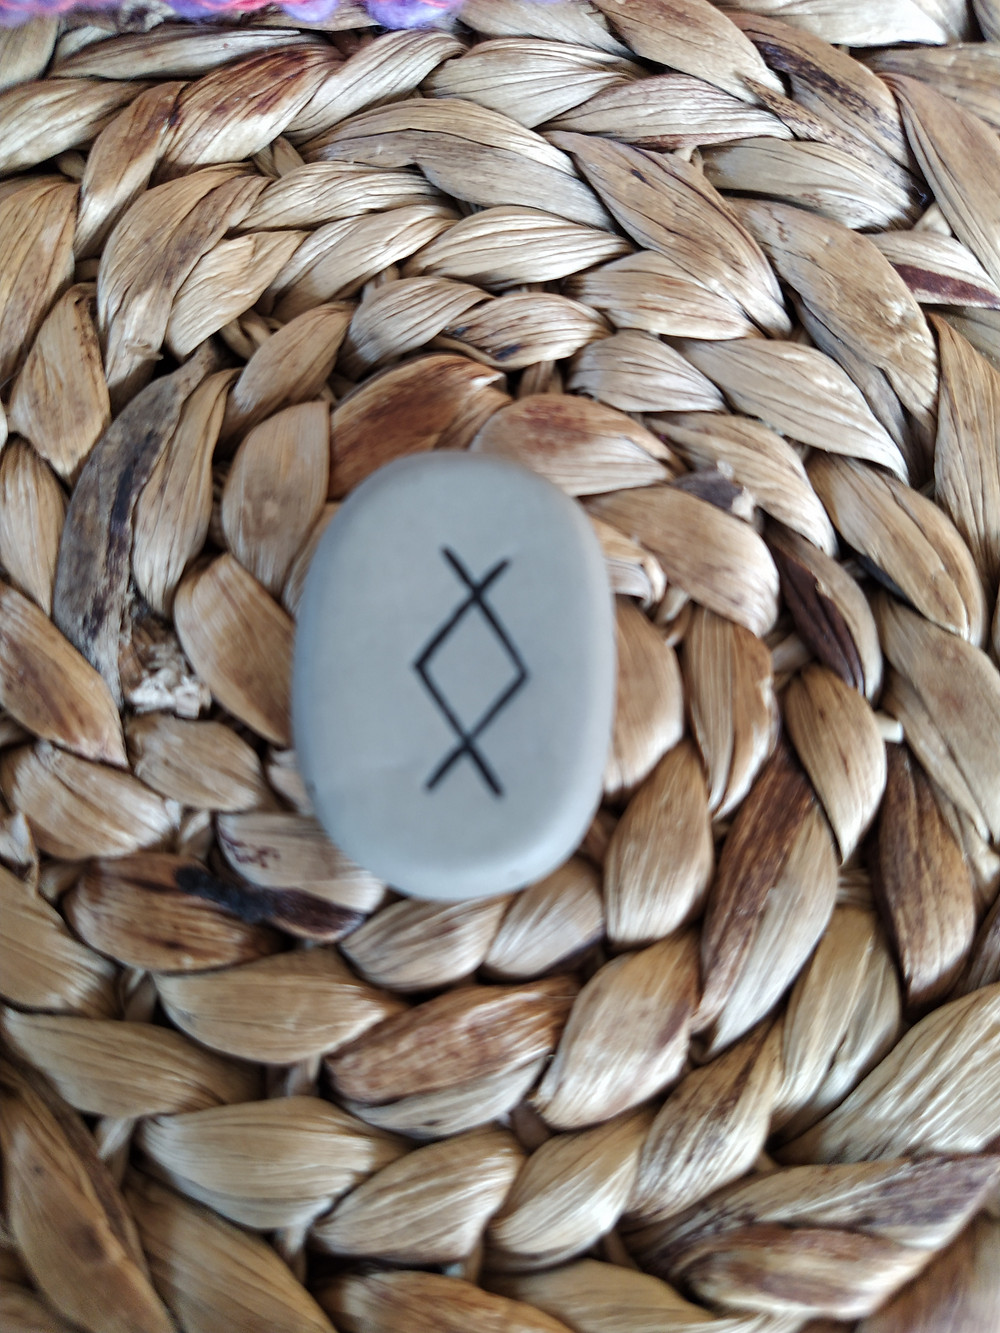 La rune Eihwaz, Eihwas, Yr, Eoh, Ihwaz, Eo, Erwaz, Ezck, Ihwar, Iwas, Iwar, Xeoh est associée à la déesse Hel.